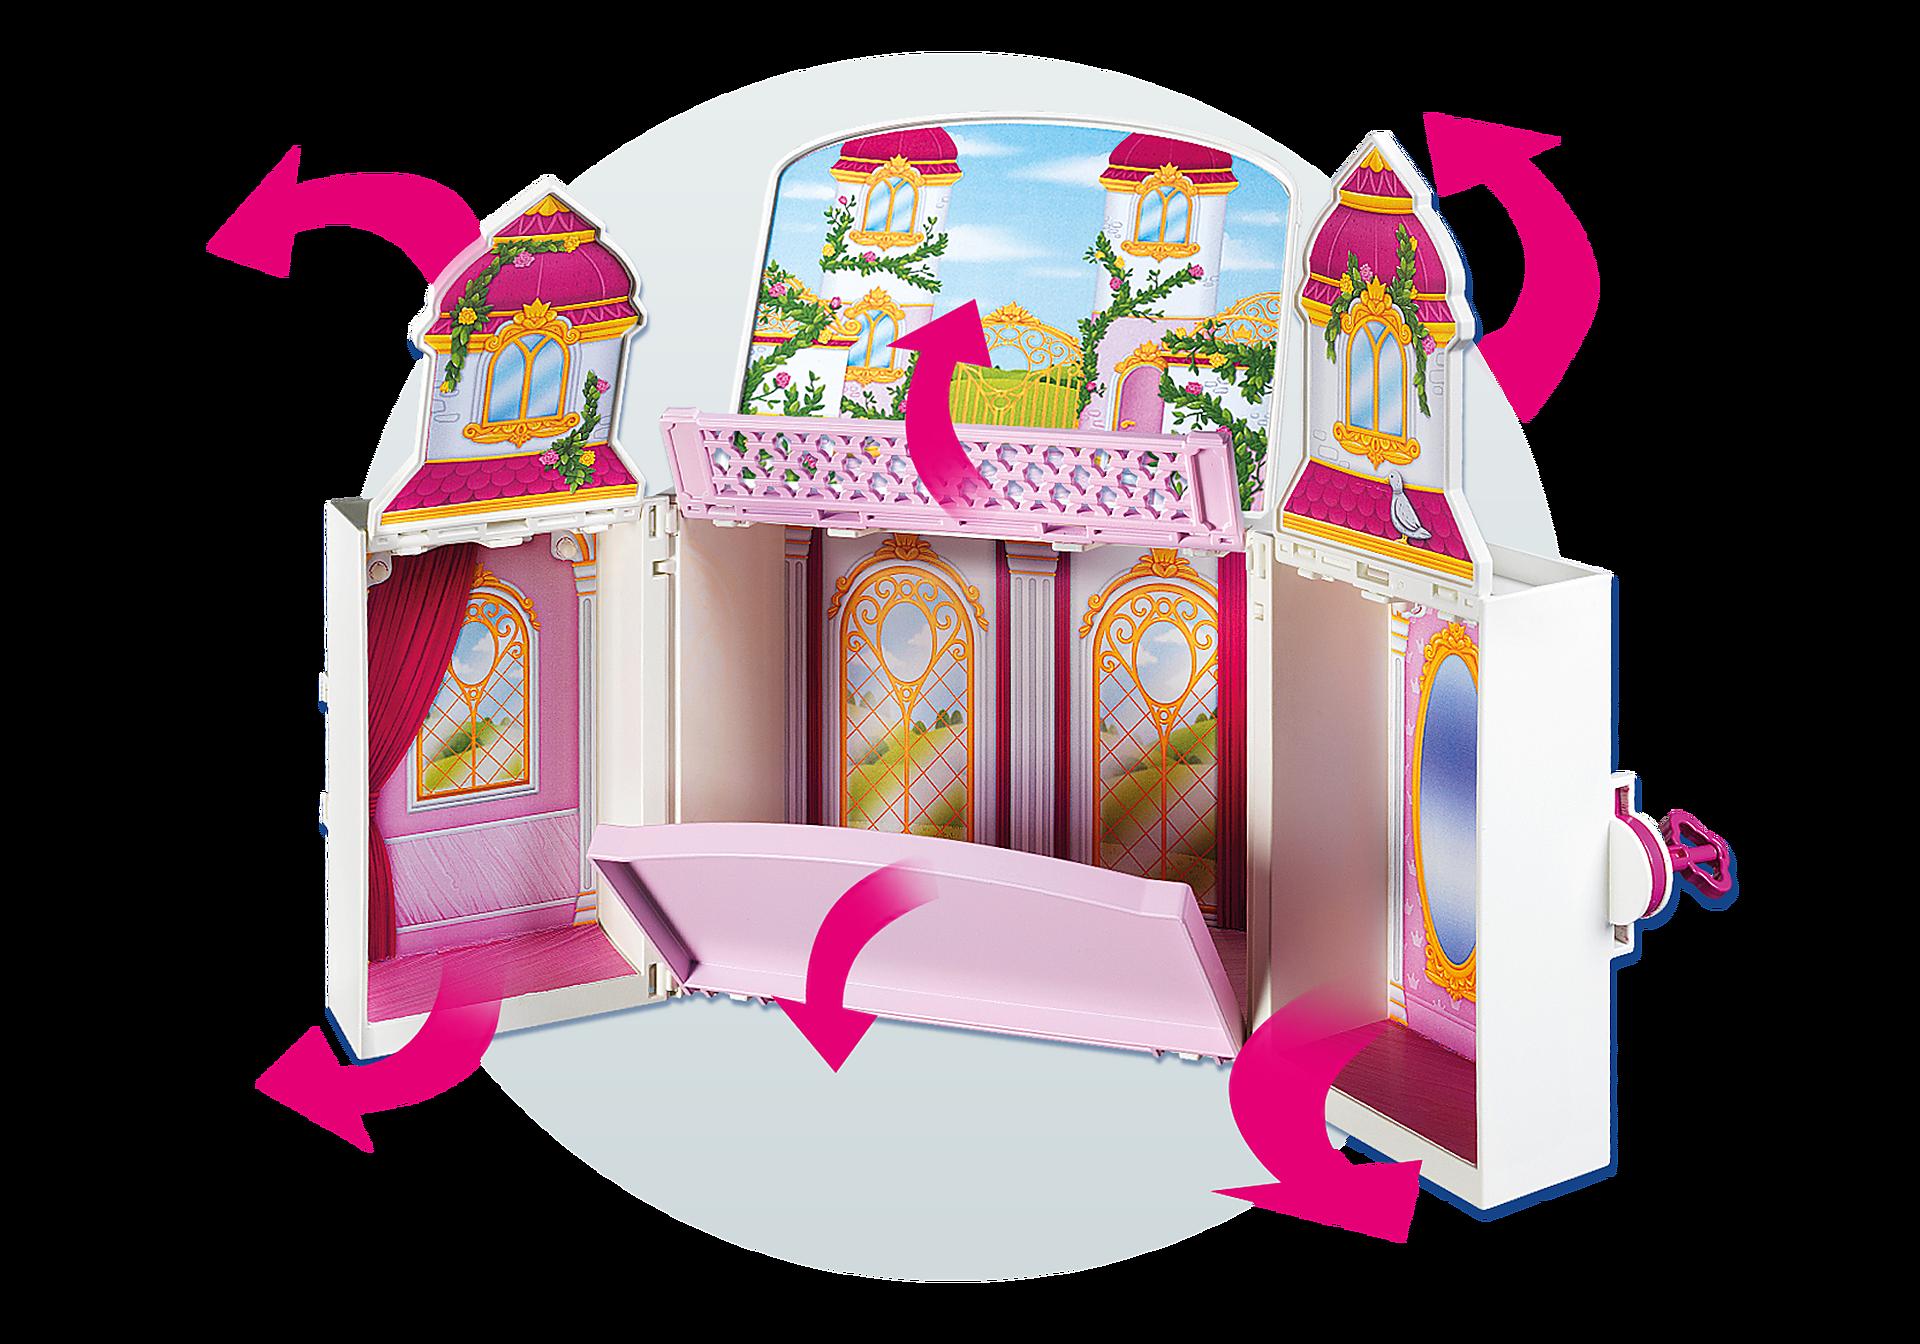 http://media.playmobil.com/i/playmobil/4898_product_extra2/Speelbox Koninklijk hof